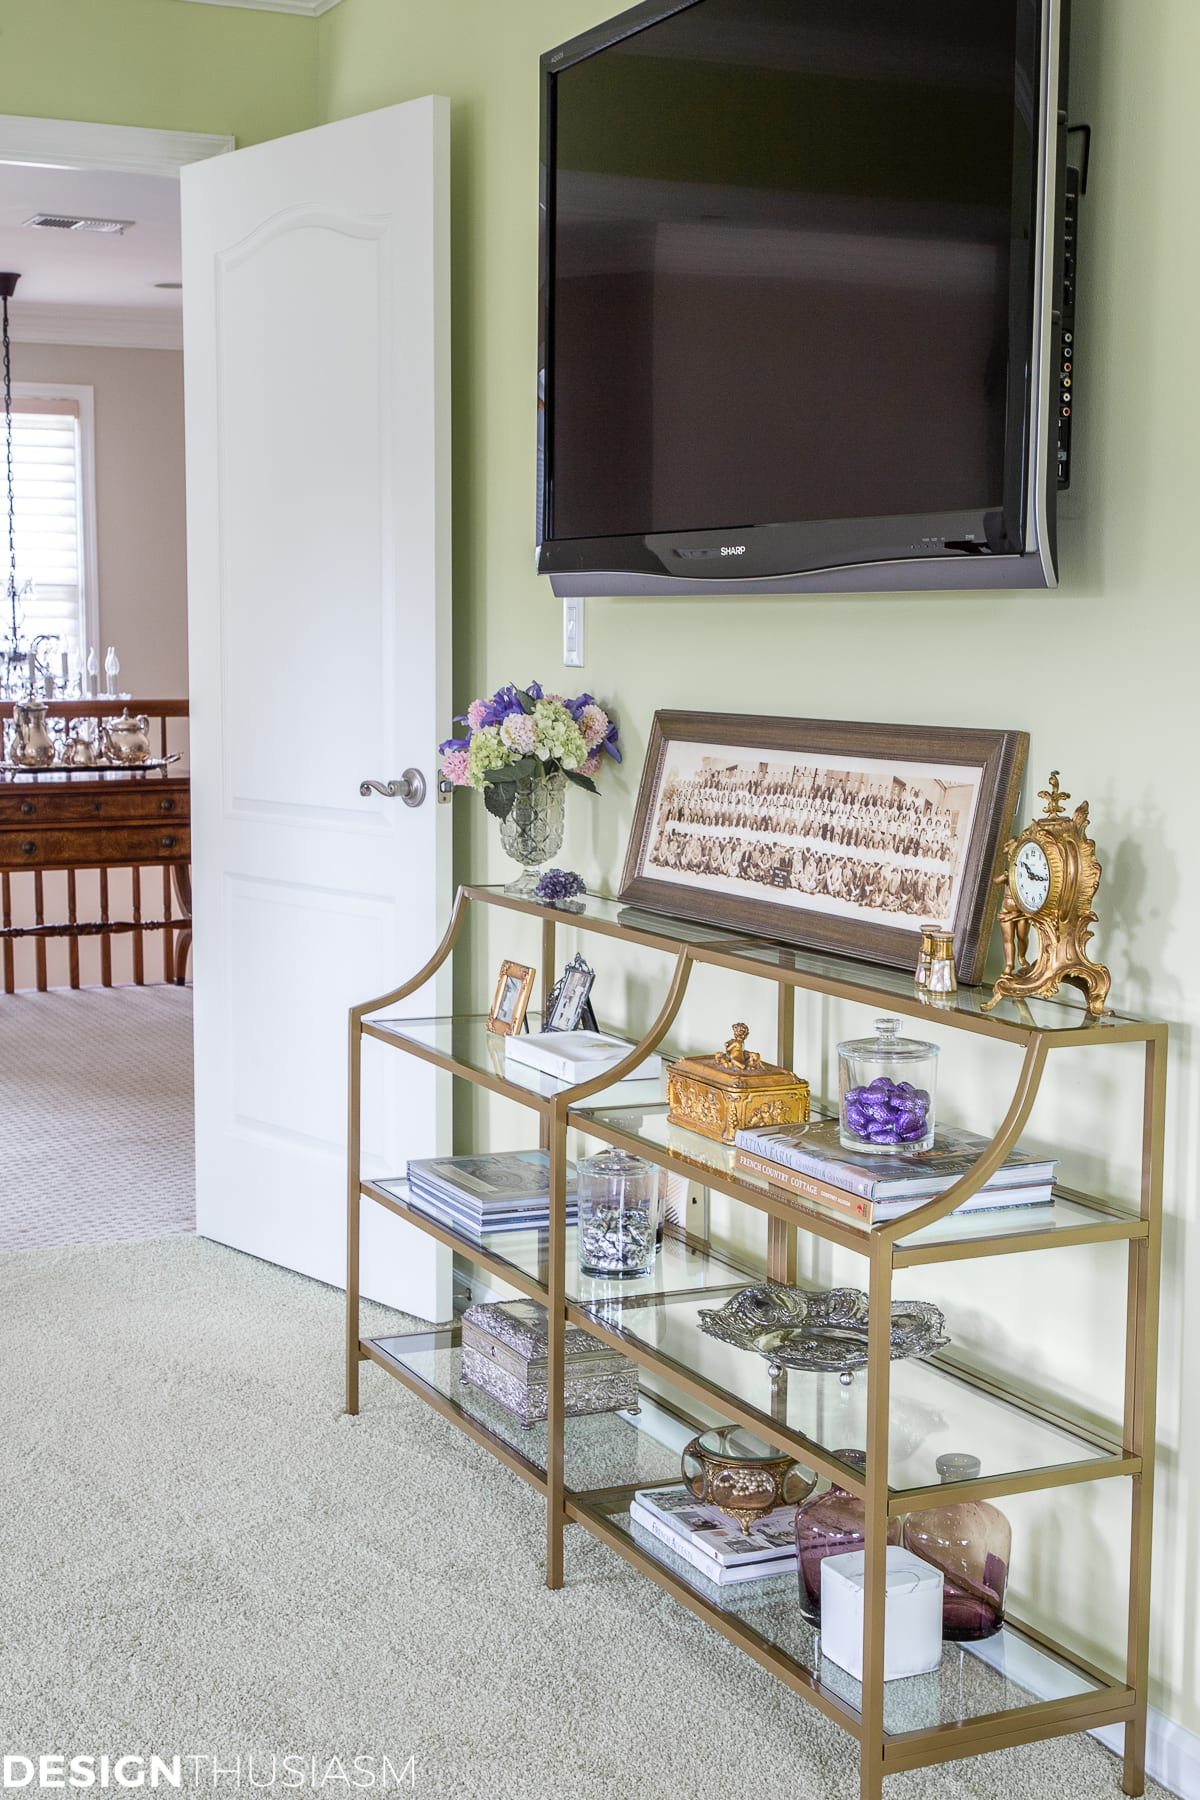 styled shelves under the Tv